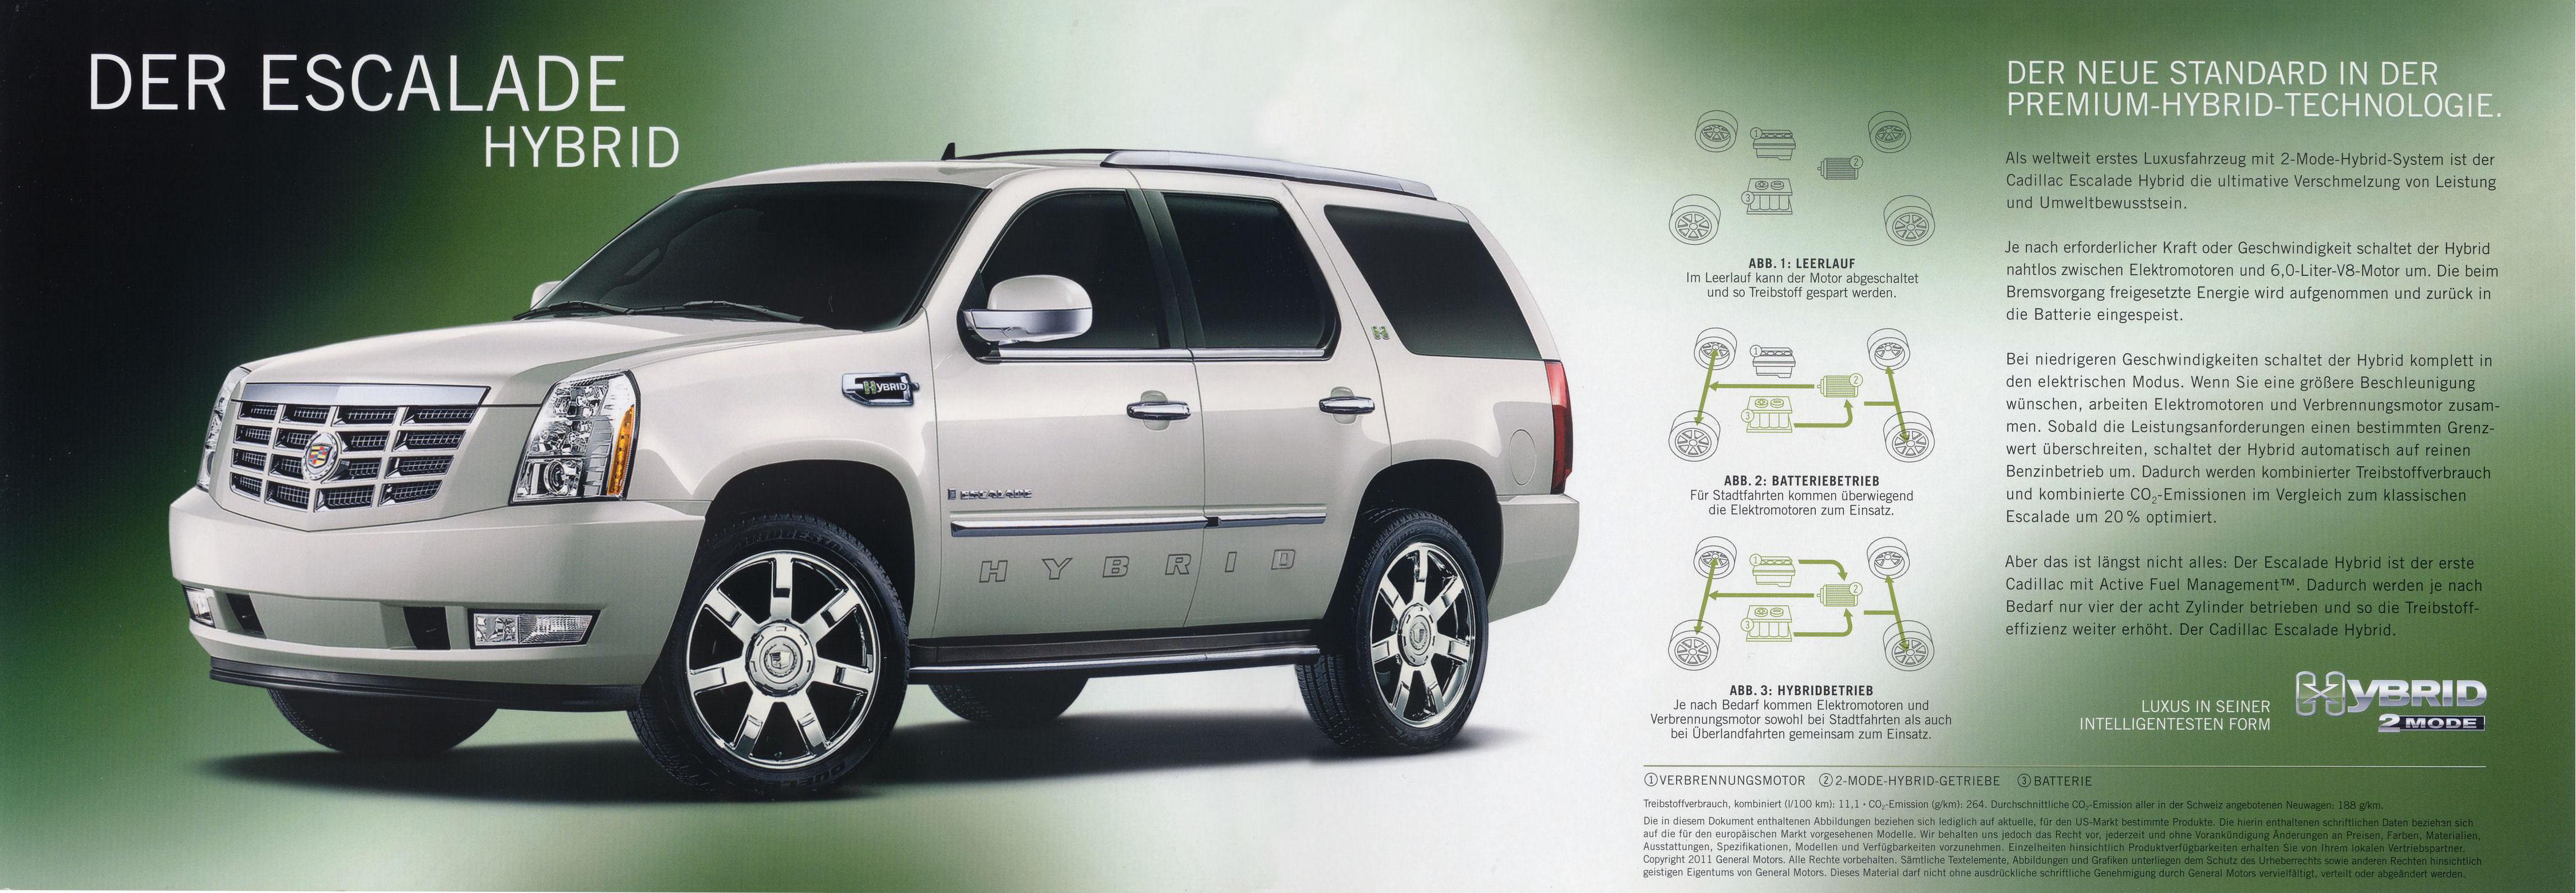 2011 Cadillac Escalade Hybrid brochure